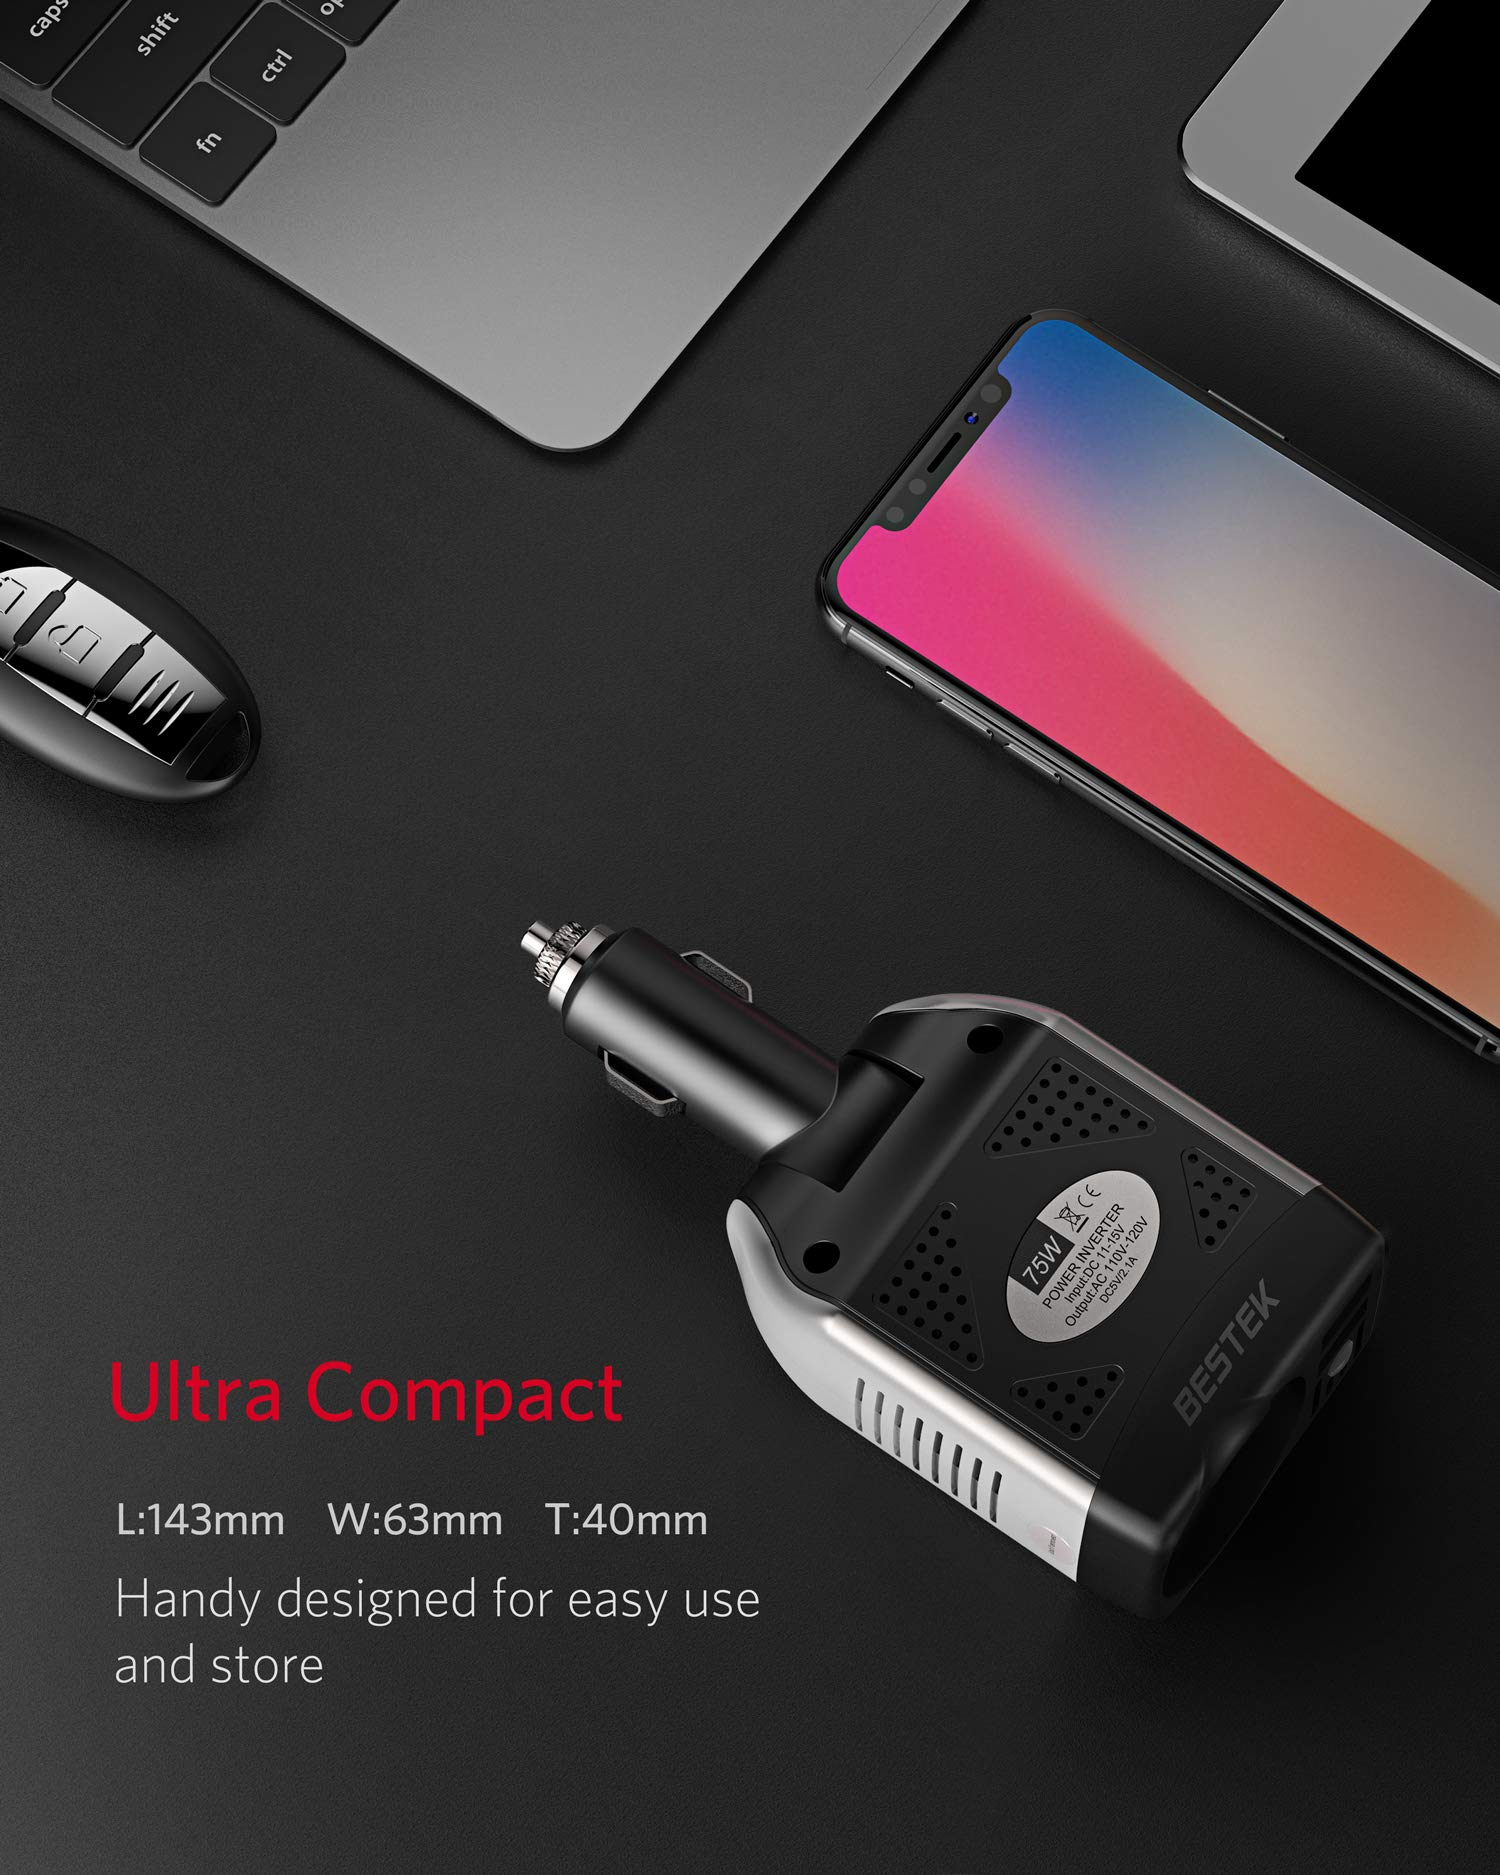 BESTEK-Spannungswandler-12V-auf-230V-Auto-USB-Ladegert-75W-KFZ-Steckdosen-Wechselrichter-12-230-fr-iPhone-iPad